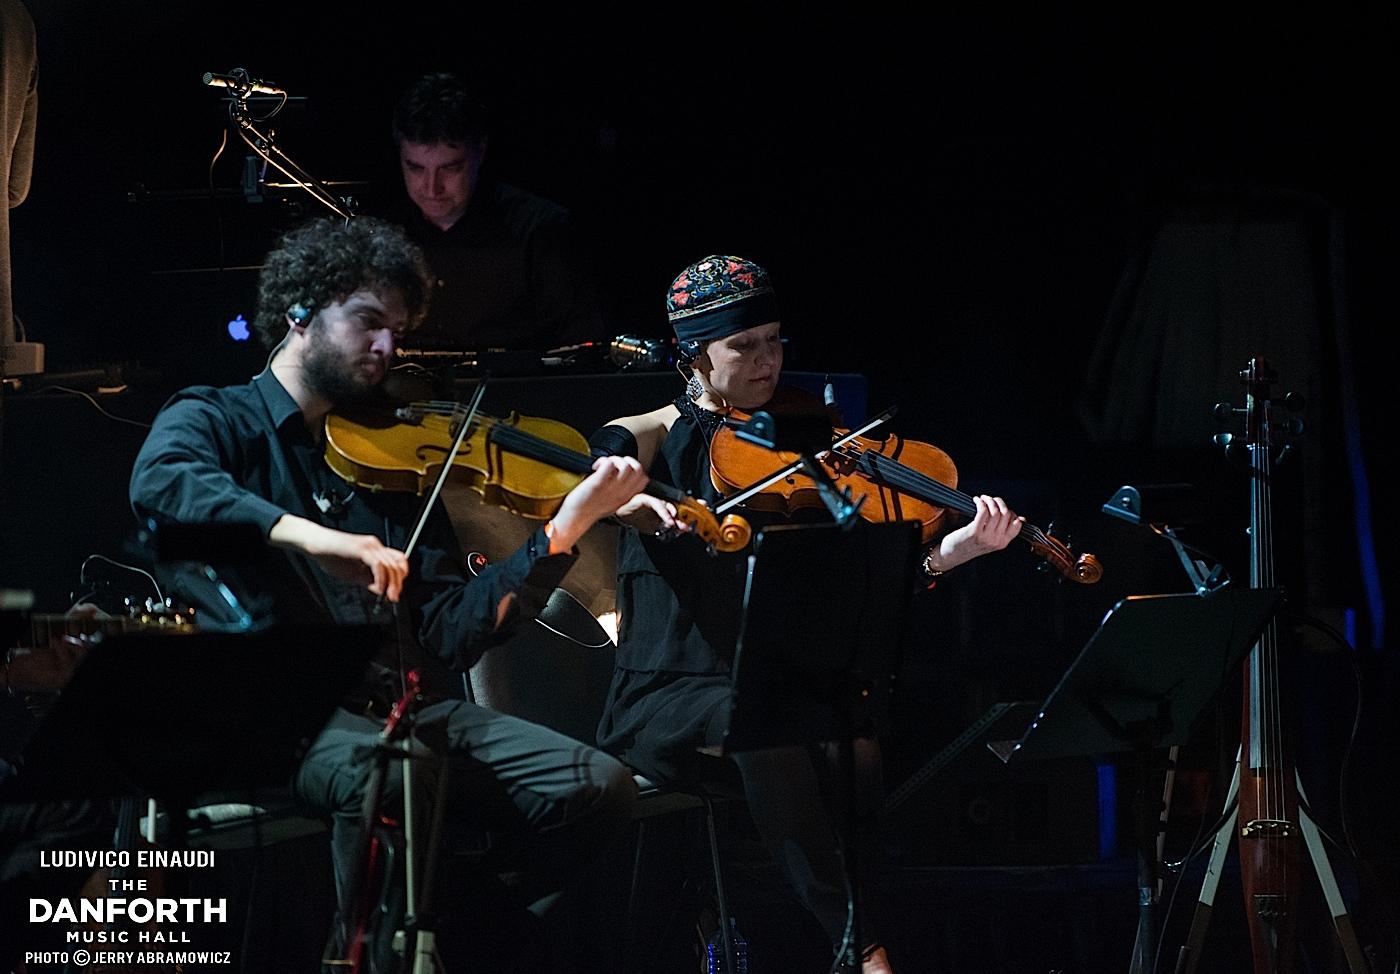 20130517 Ludivico Einaudi performs at The Danforth Music Hall Toronto 0125